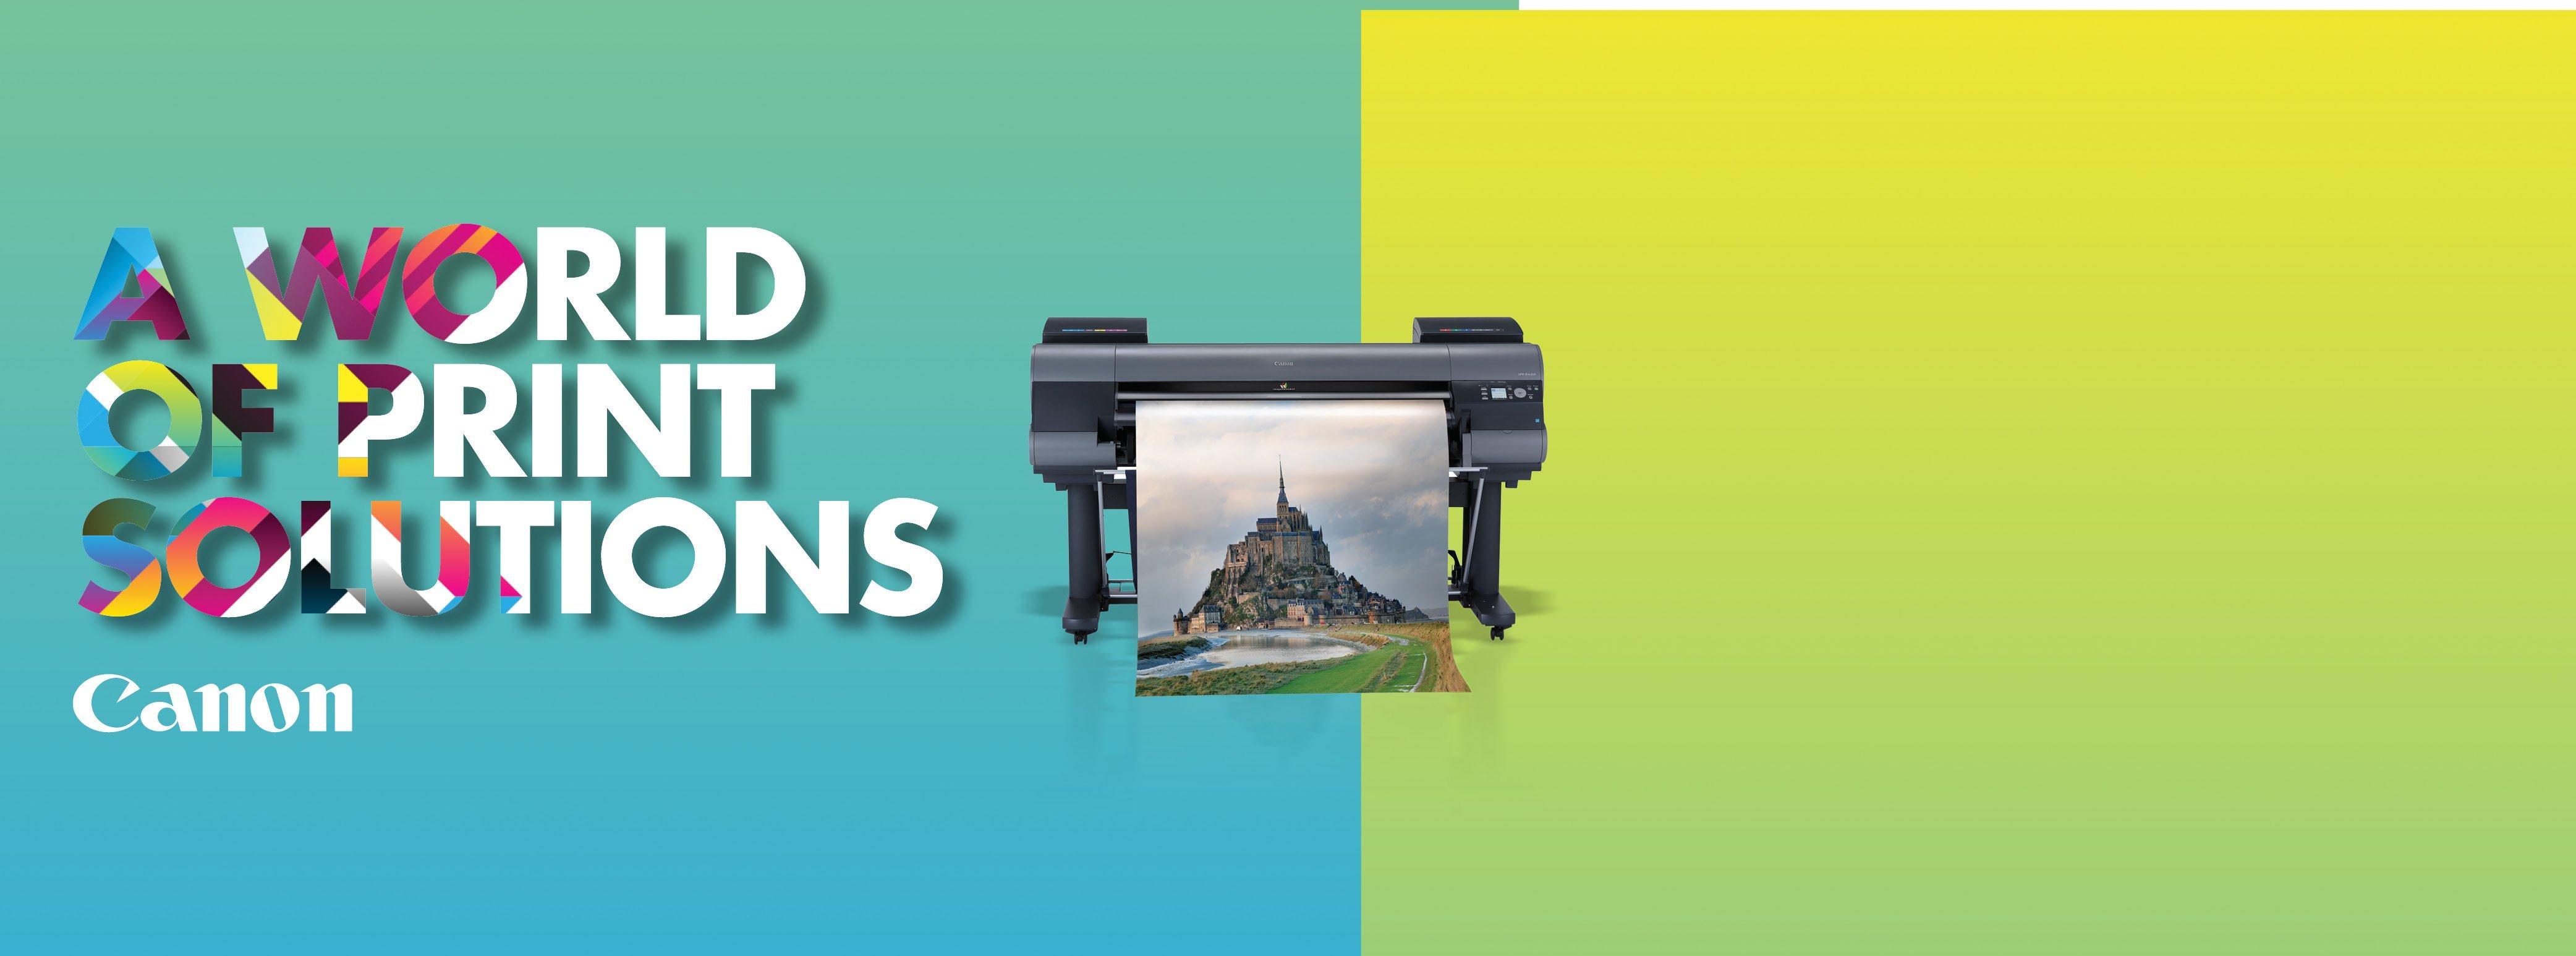 14 222 printers bunners 2000x742 1 1, מדפסות לייזר צבע, מדפסות לייזר צבעוניות, מדפסות לייזר לעסק, מדפסות לייזר למשרד